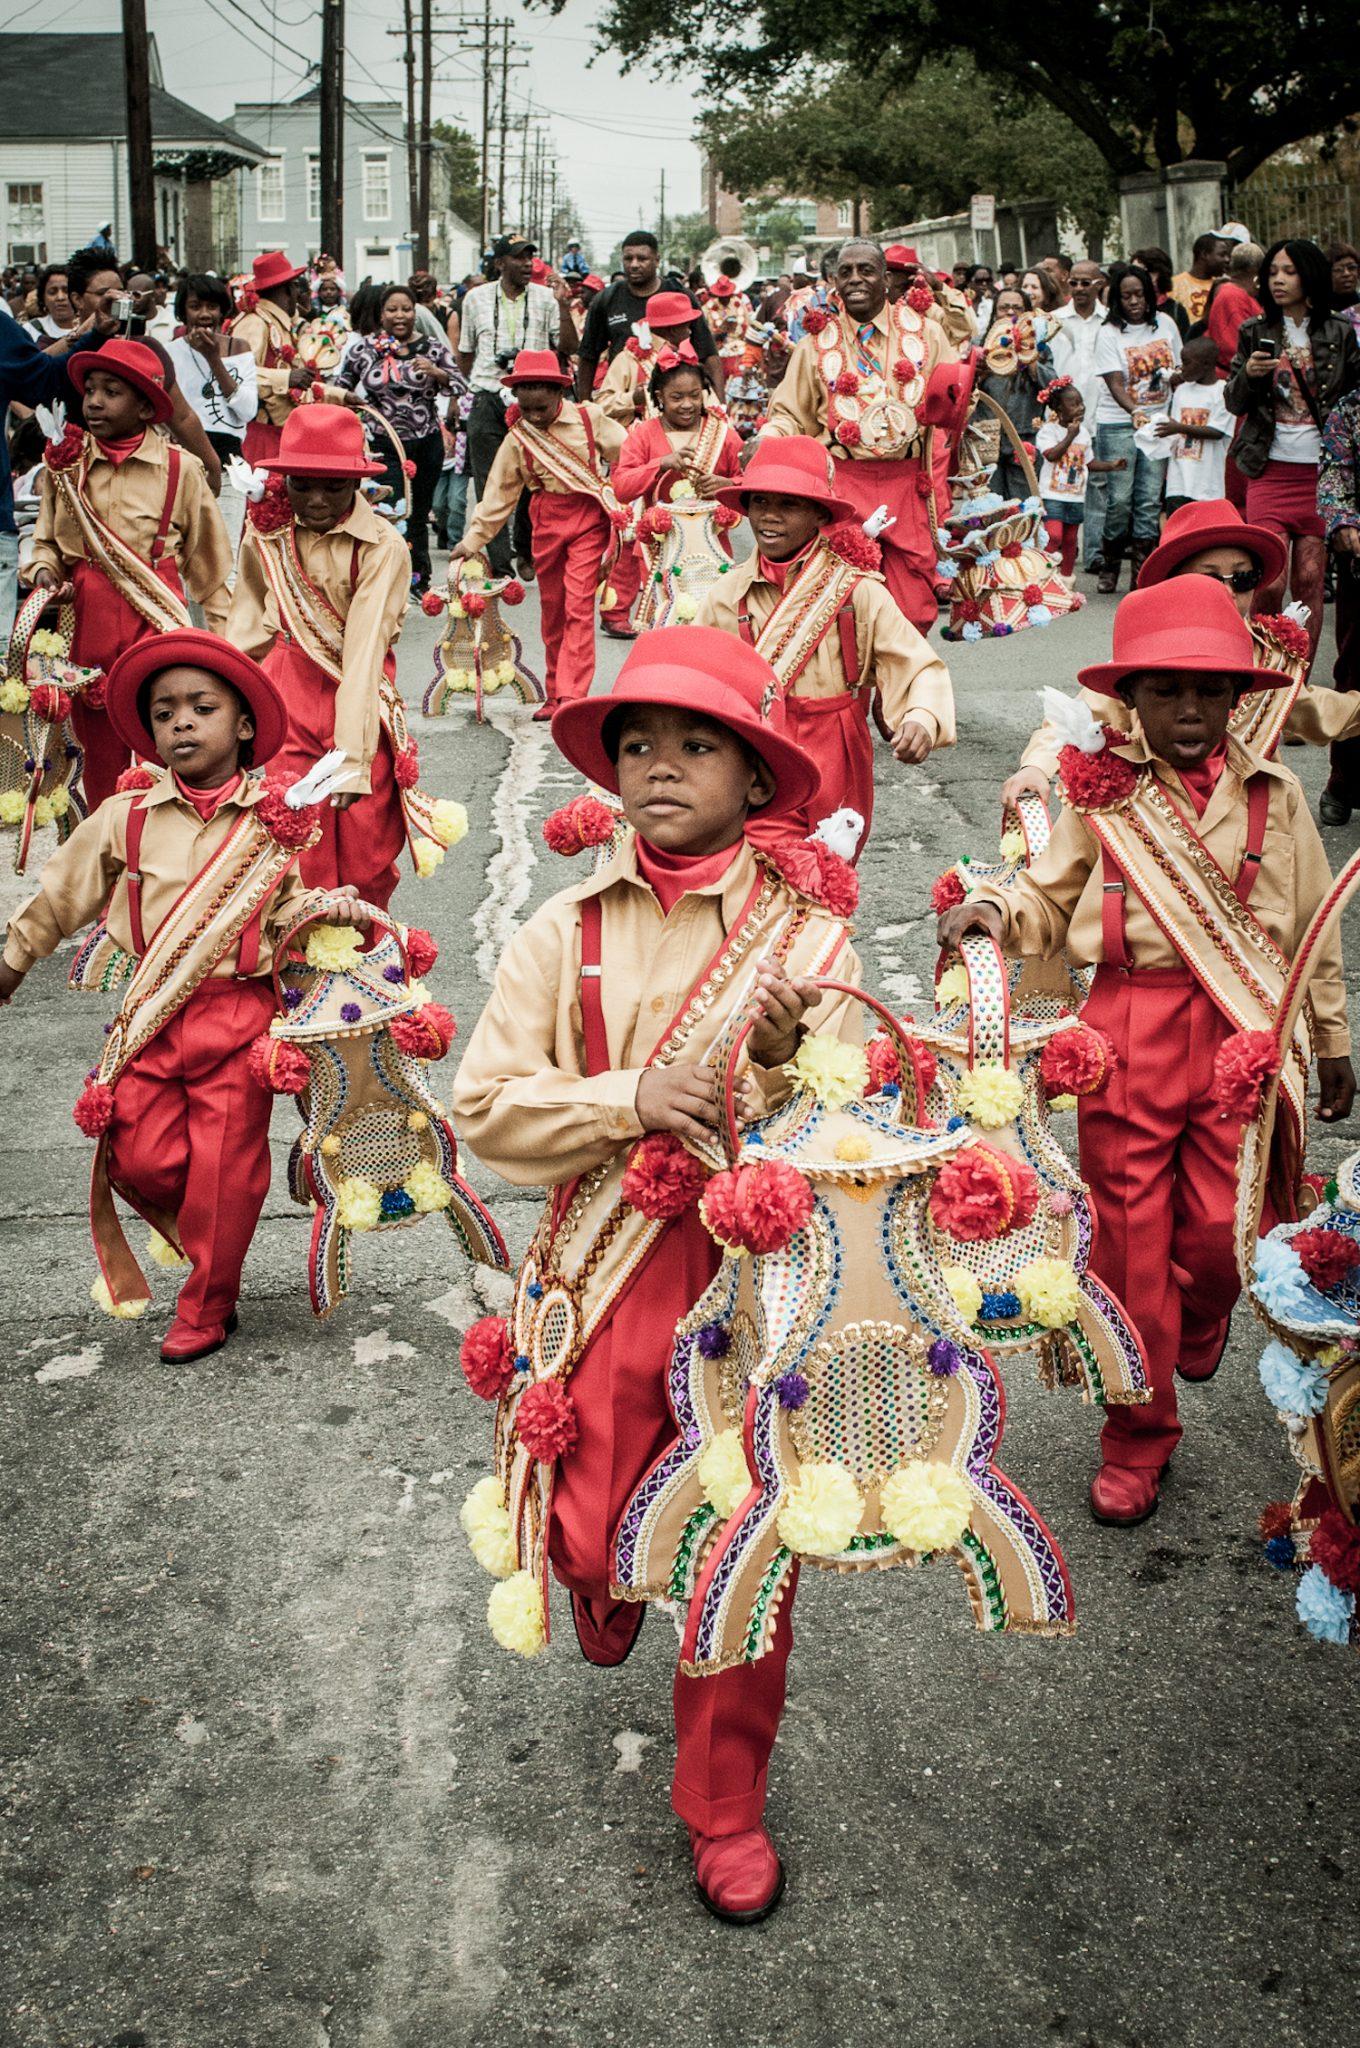 New Orleans Second Line Parades: Photographs by Pableaux Johnson Exhibit